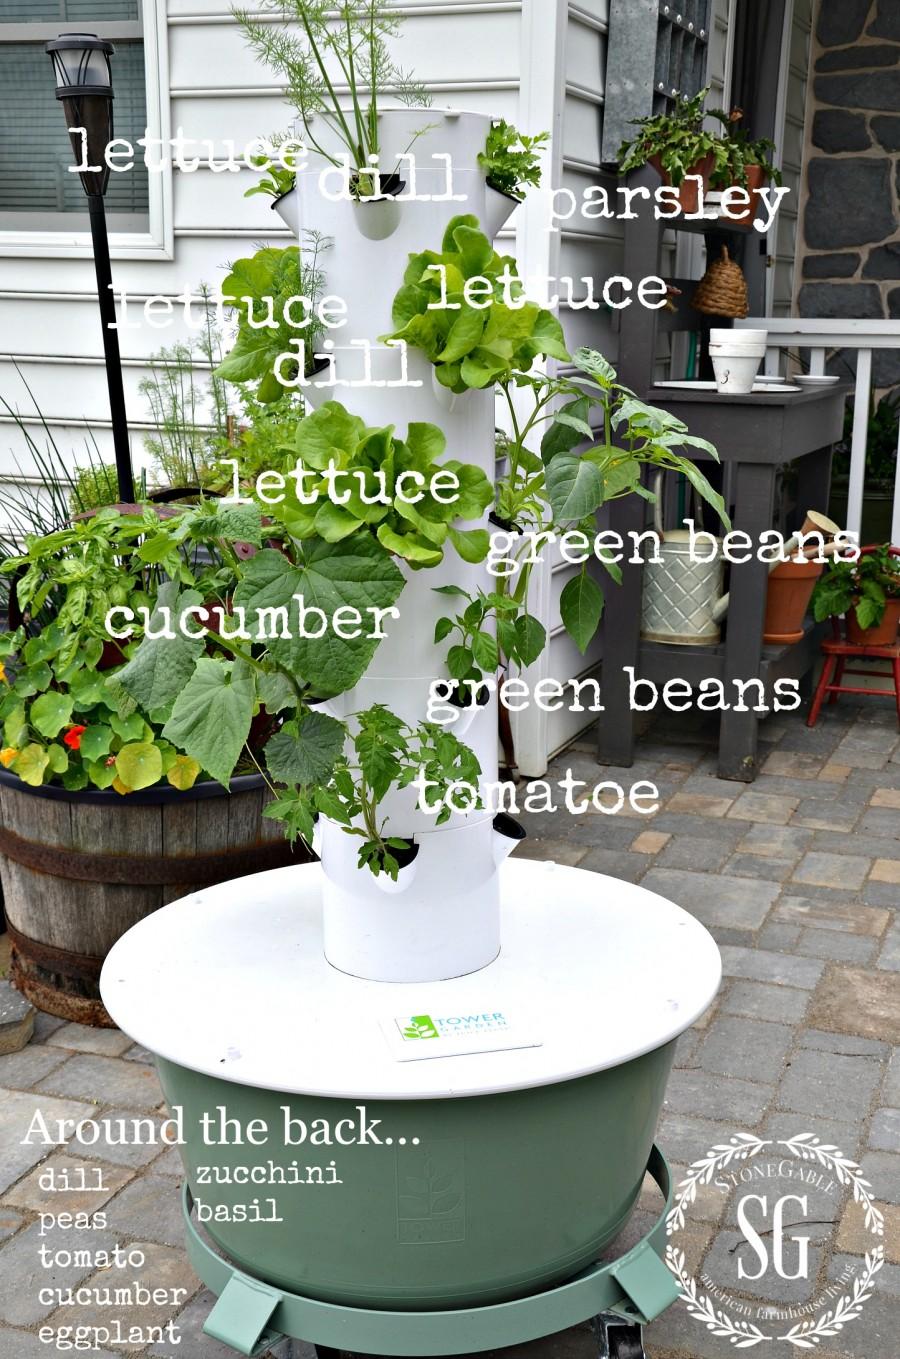 TOWER GARDEN-growing veggies and herbs-stonegableblog.com